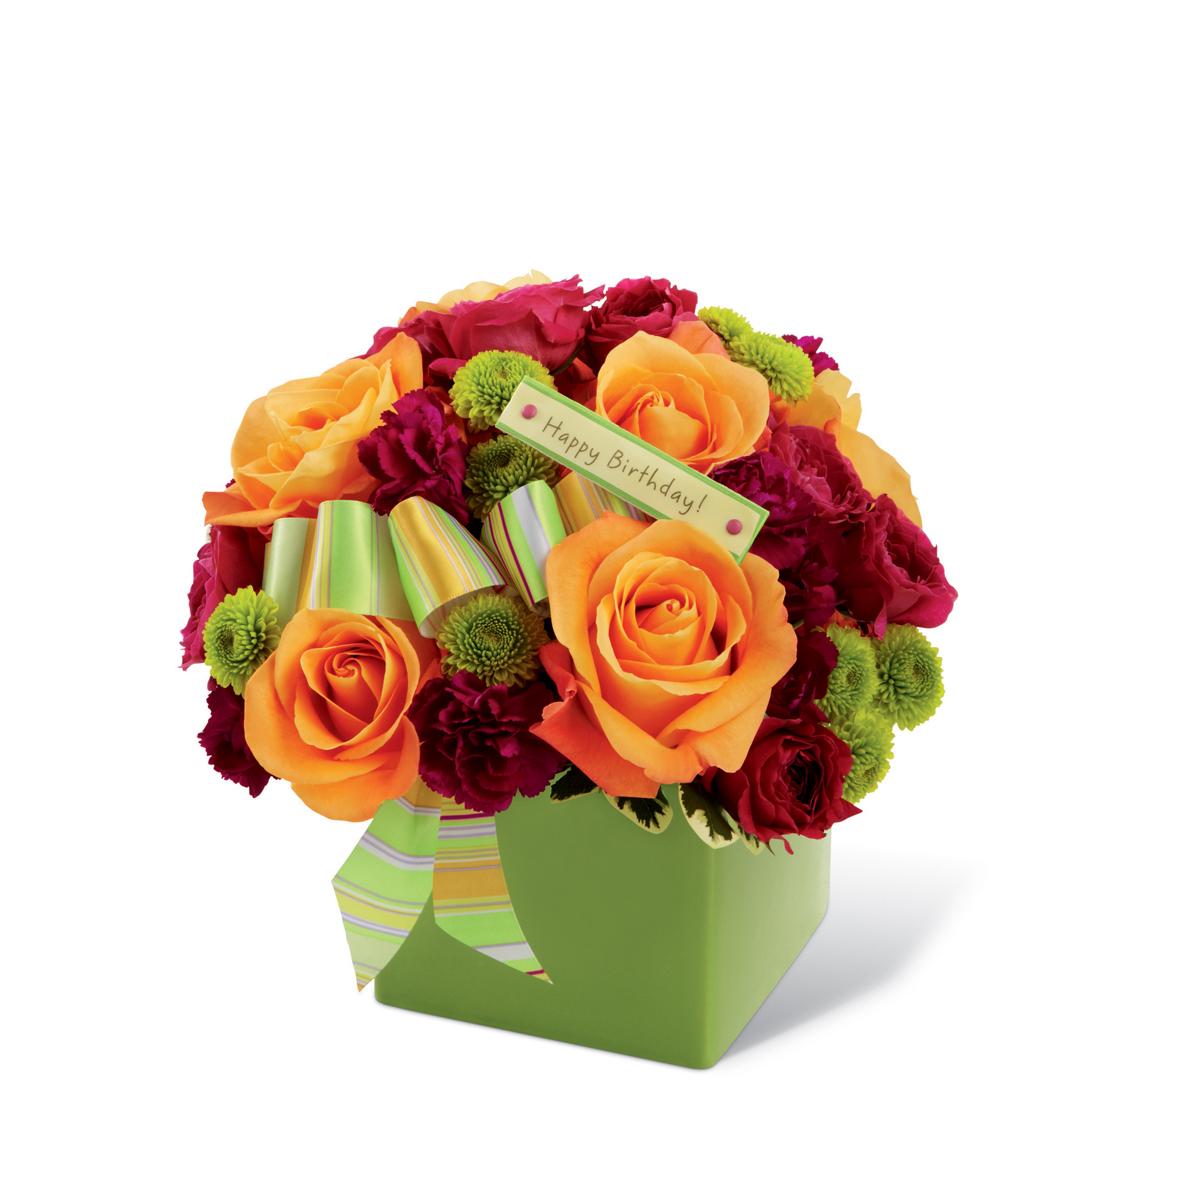 The ftd birthday bouquet south woodstock ct florist izmirmasajfo